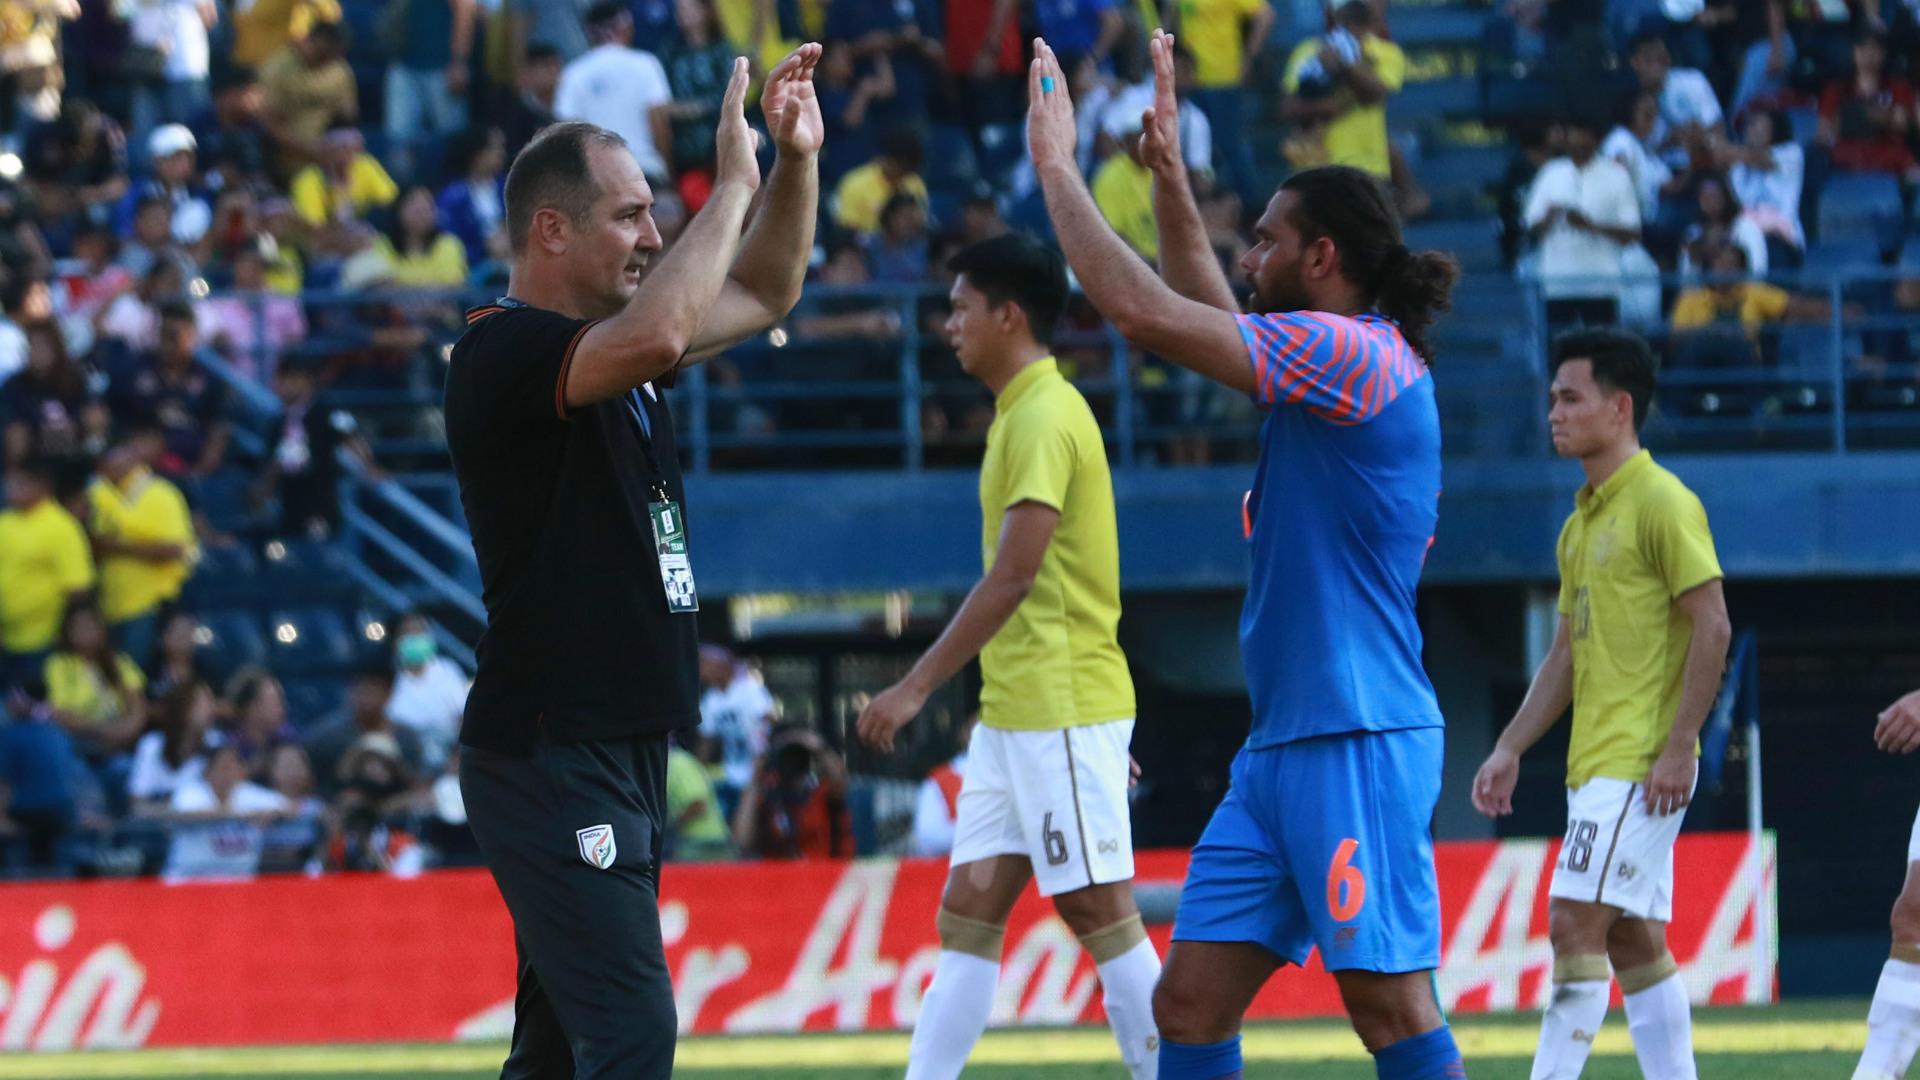 Adil Khan rates - goal line clearance or equaliser against Bangladesh?